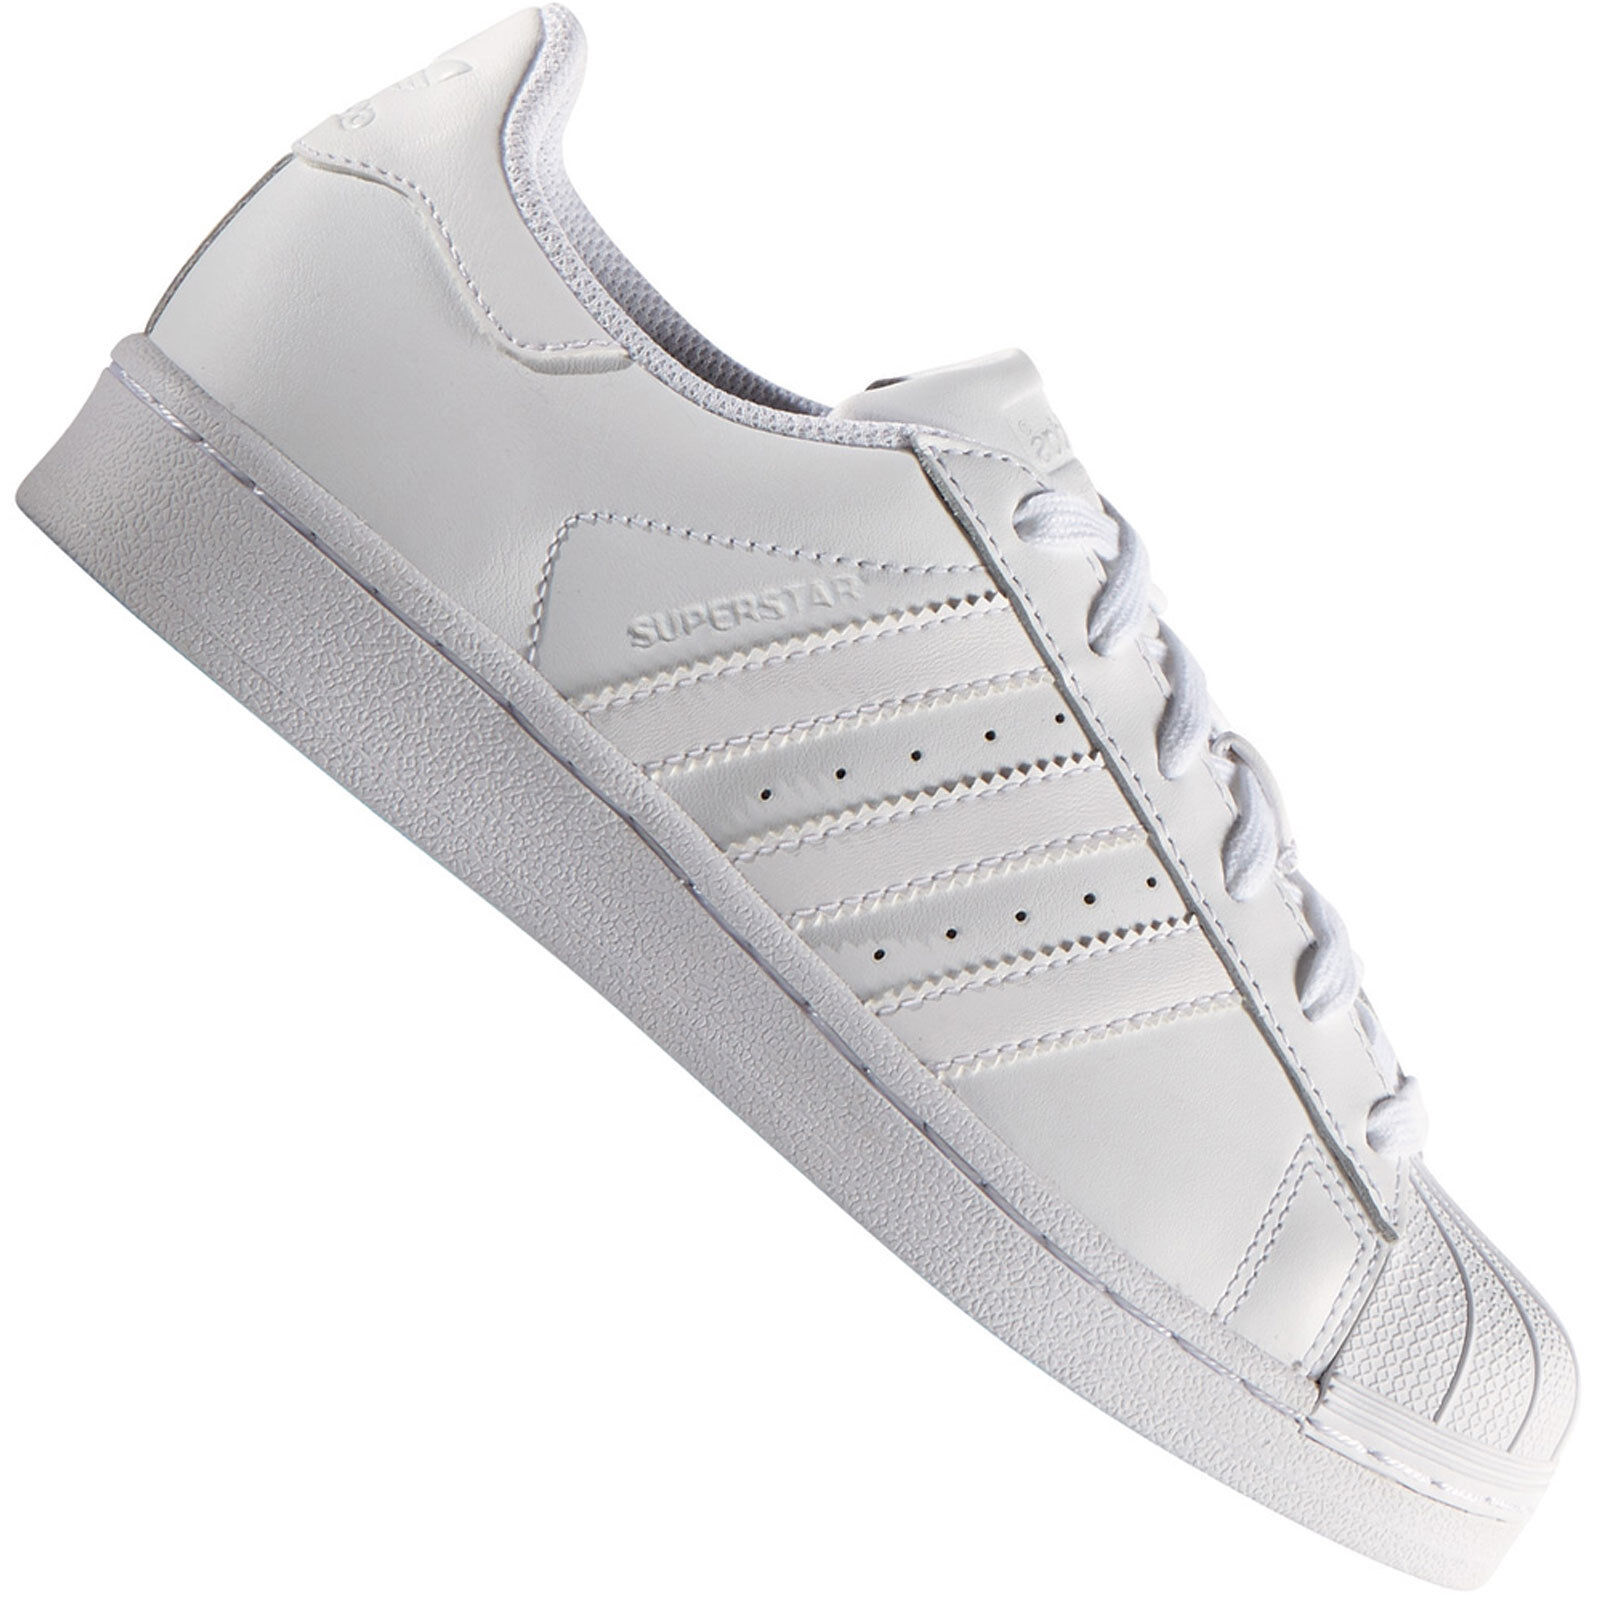 ADIDAS Superstar Foundation Da Donna   Basse Uomo Sneaker Scarpe Basse   Scarpe Da Ginnastica Scarpe 734c5d